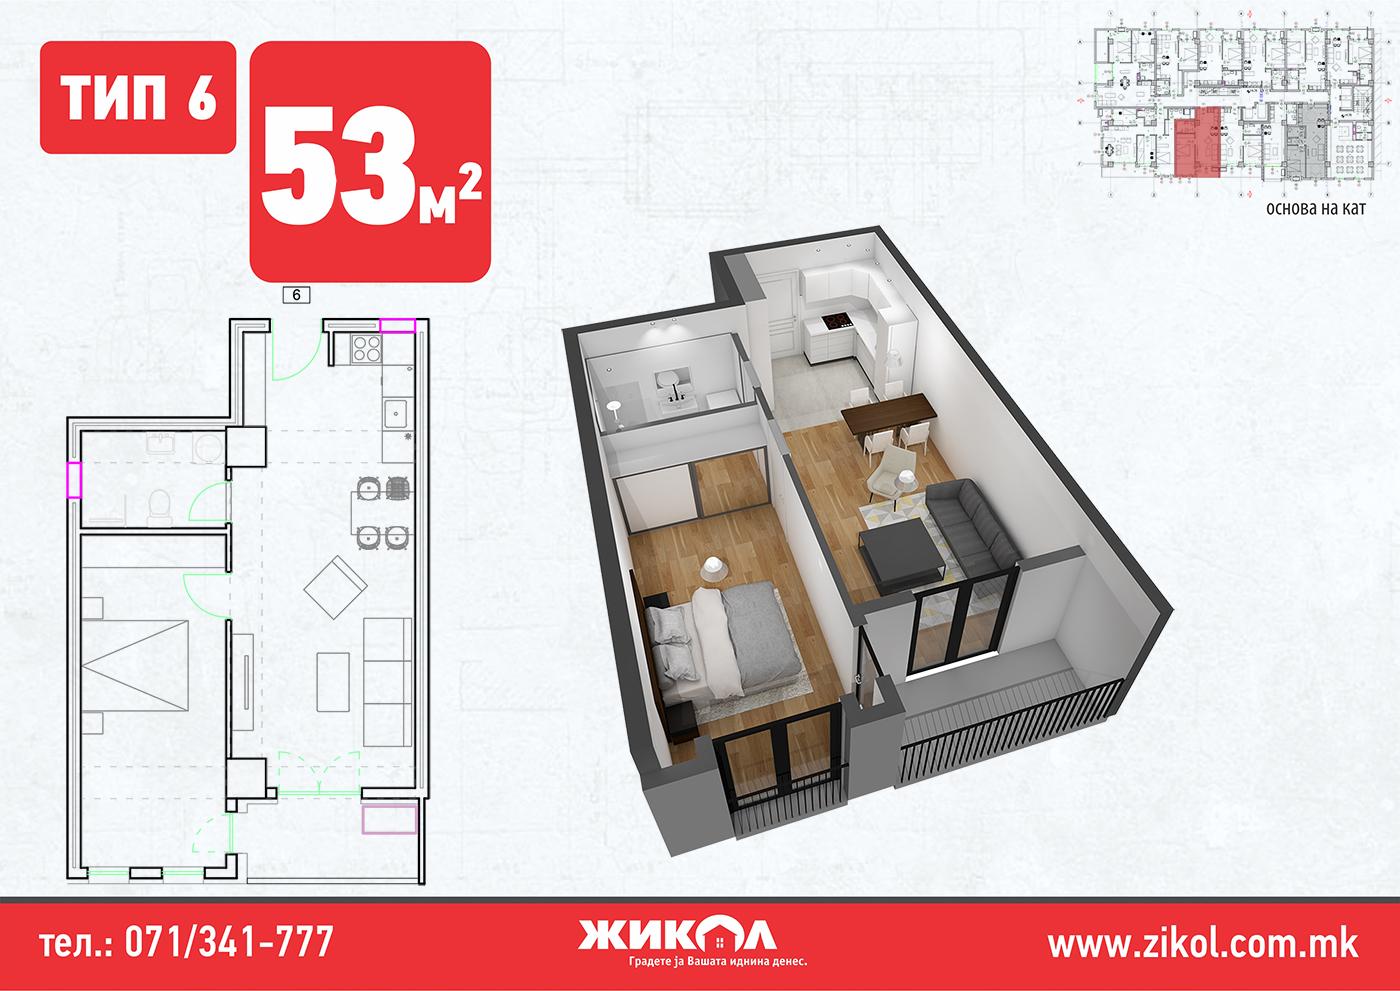 Зграда 55, кат 1, стан 6